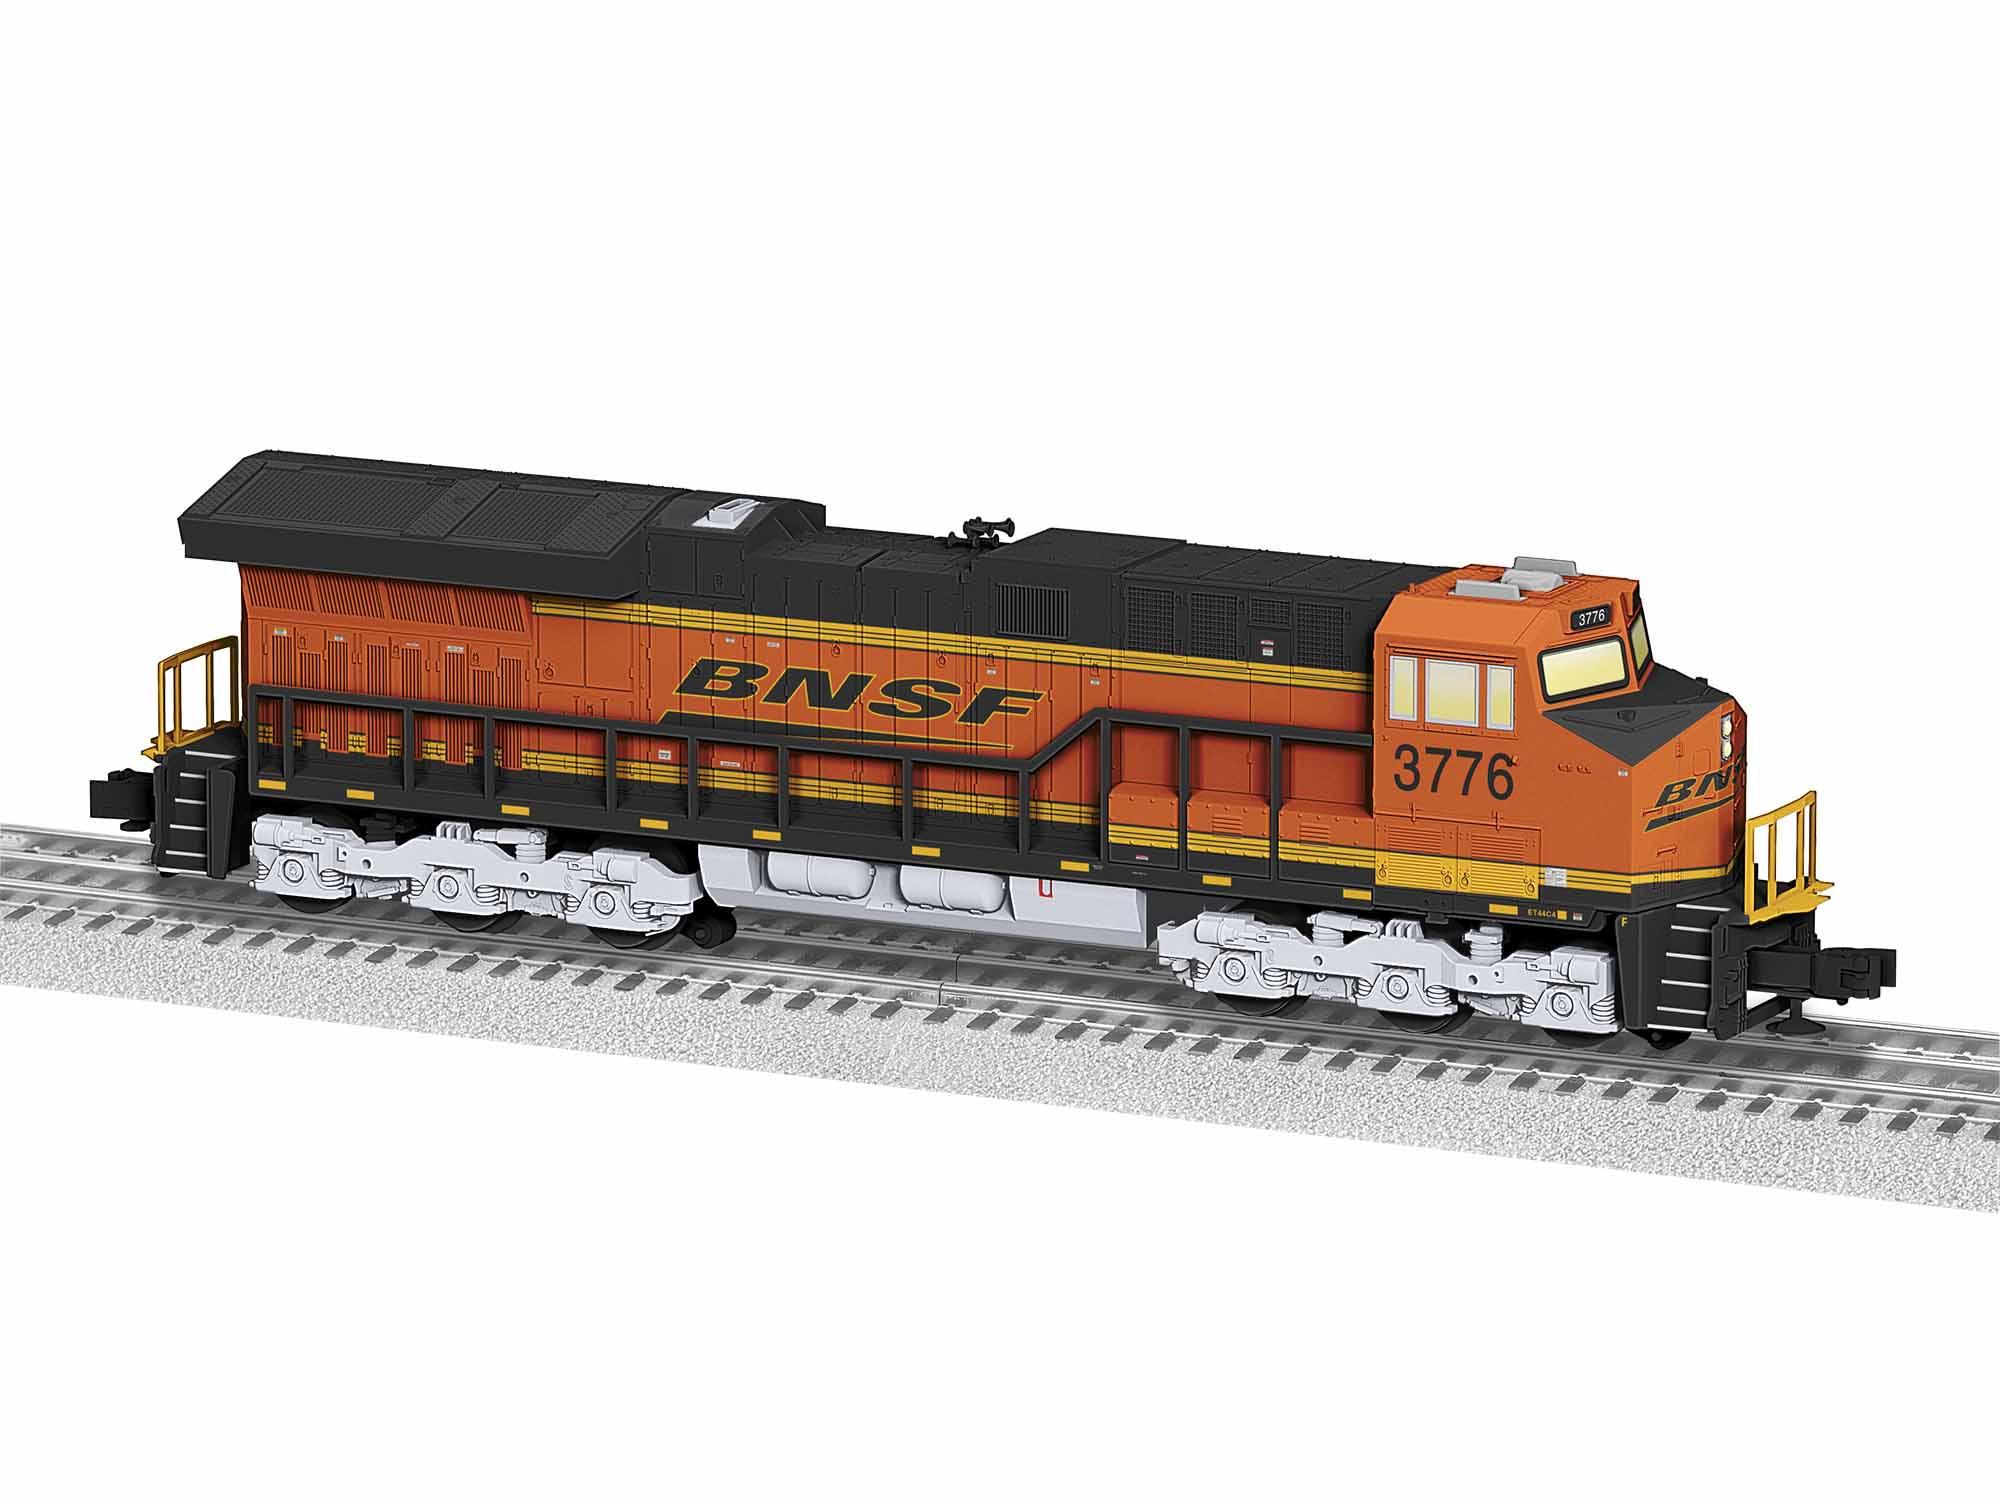 LNL1934012 Lionel O-31 ET44AC, BNSF #3776